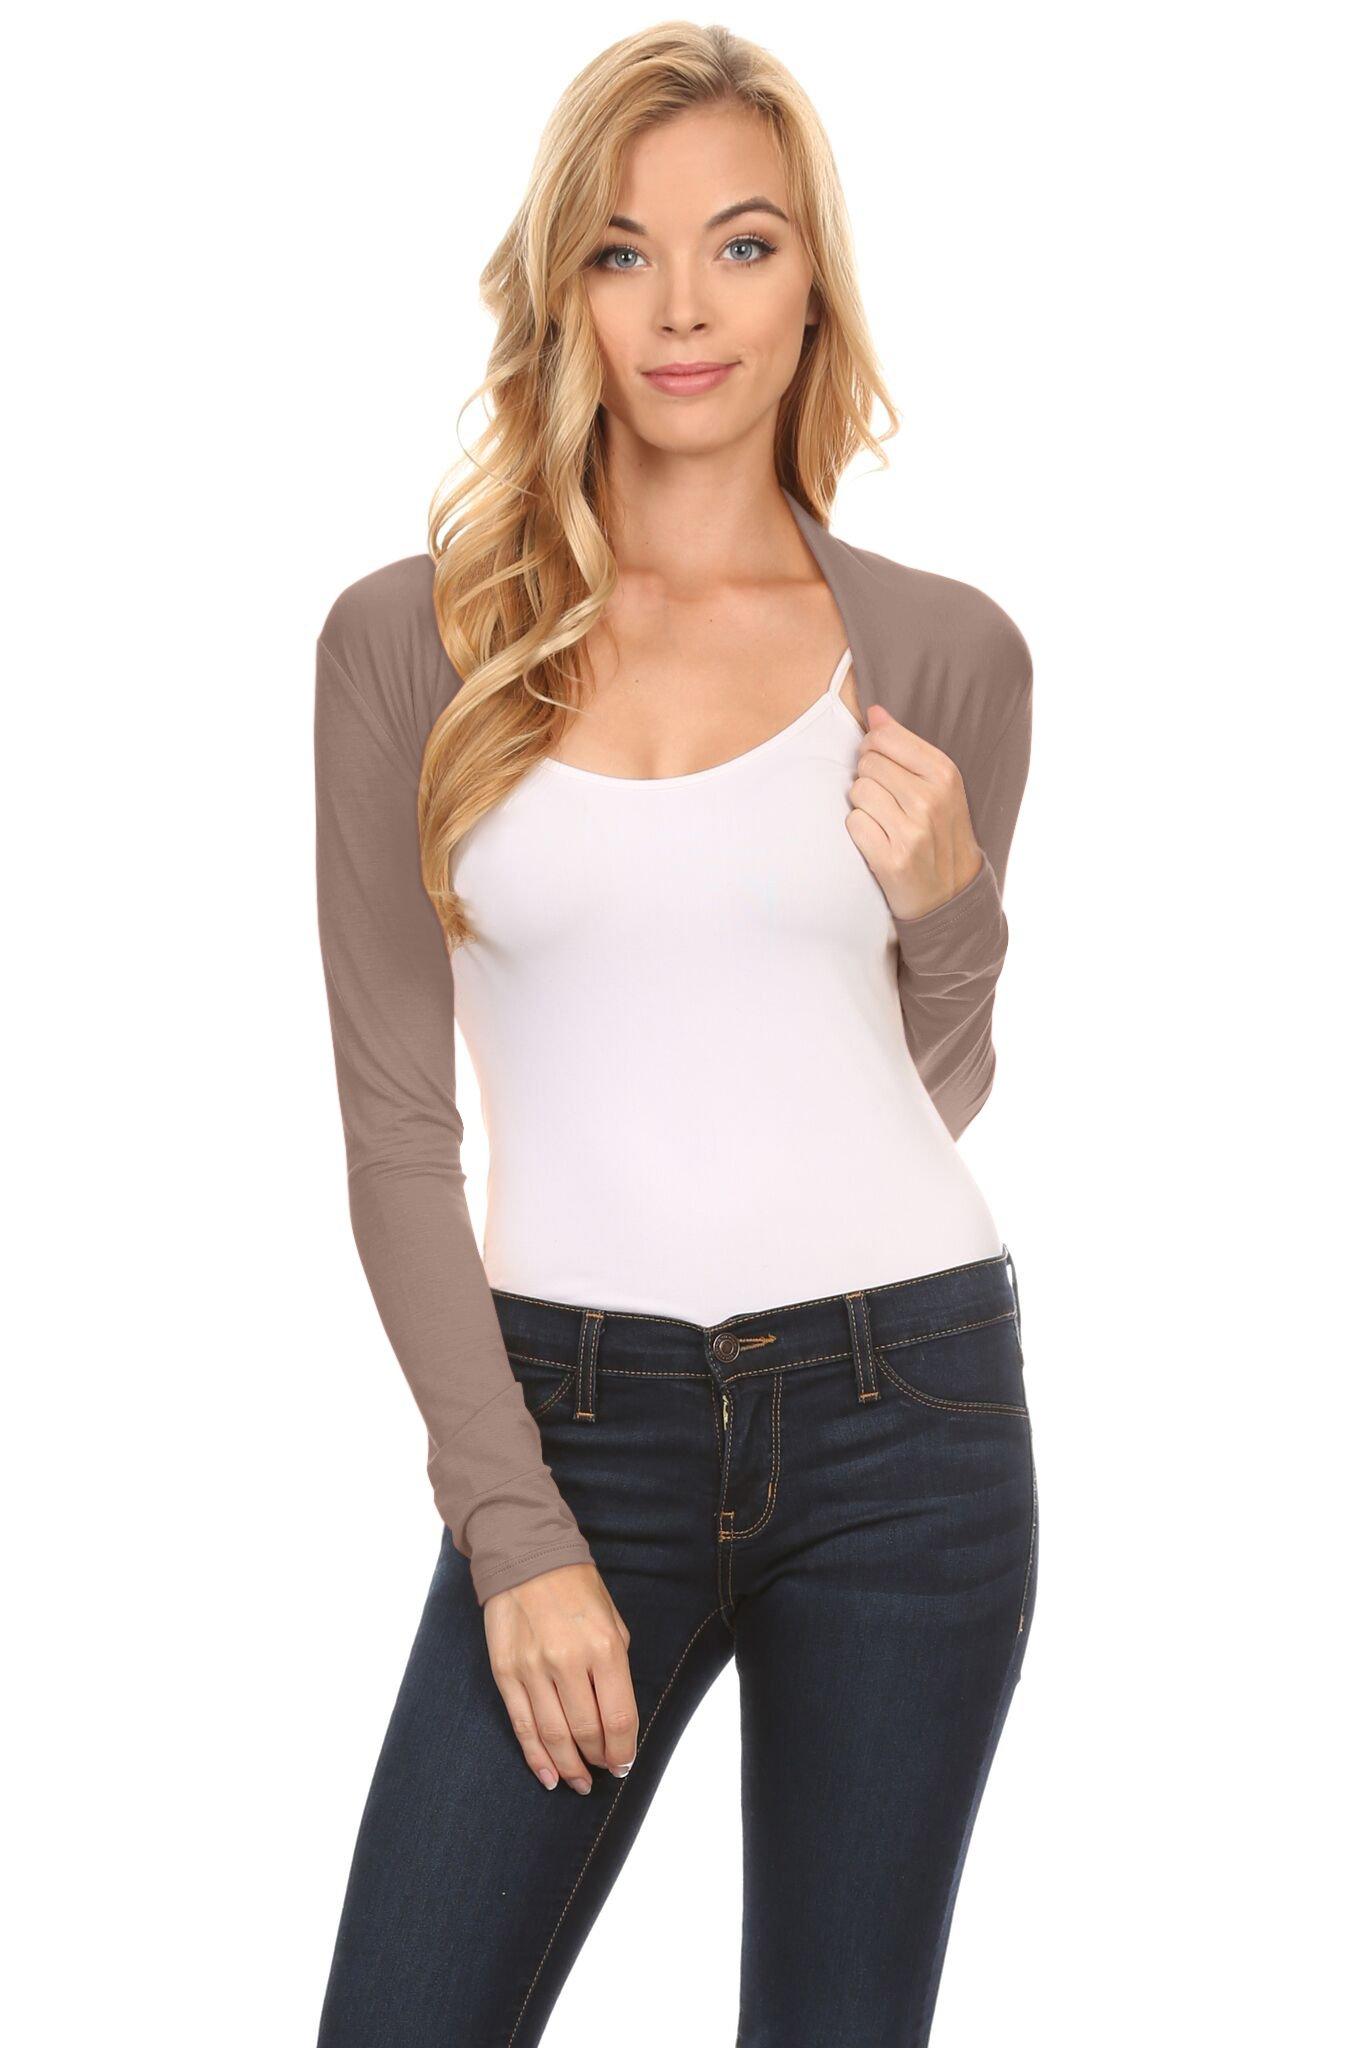 Simlu Long Sleeve Bolero Shrug for Women Reg and Plus Size- Made in USA (Size Medium, Mocha)